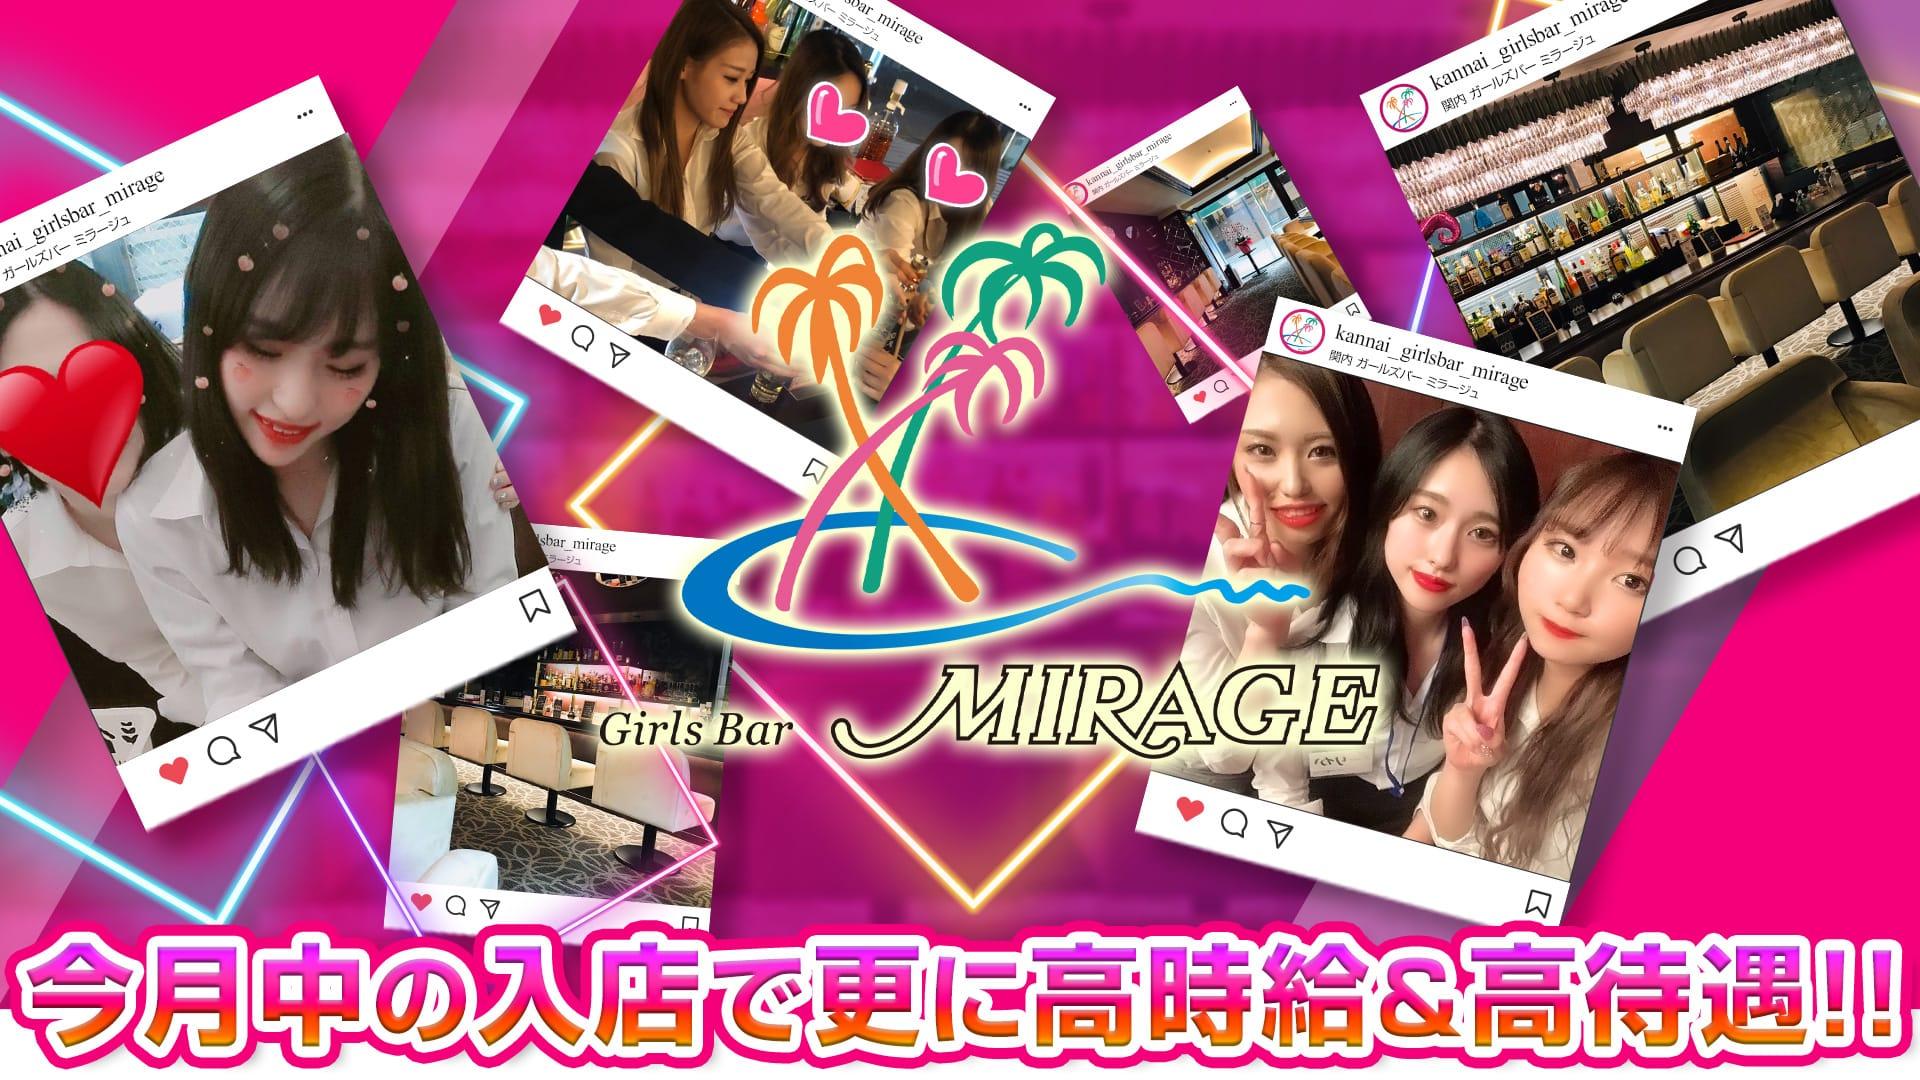 Girl's Bar Mirage(ミラージュ)【公式求人・体入情報】 関内ガールズバー TOP画像